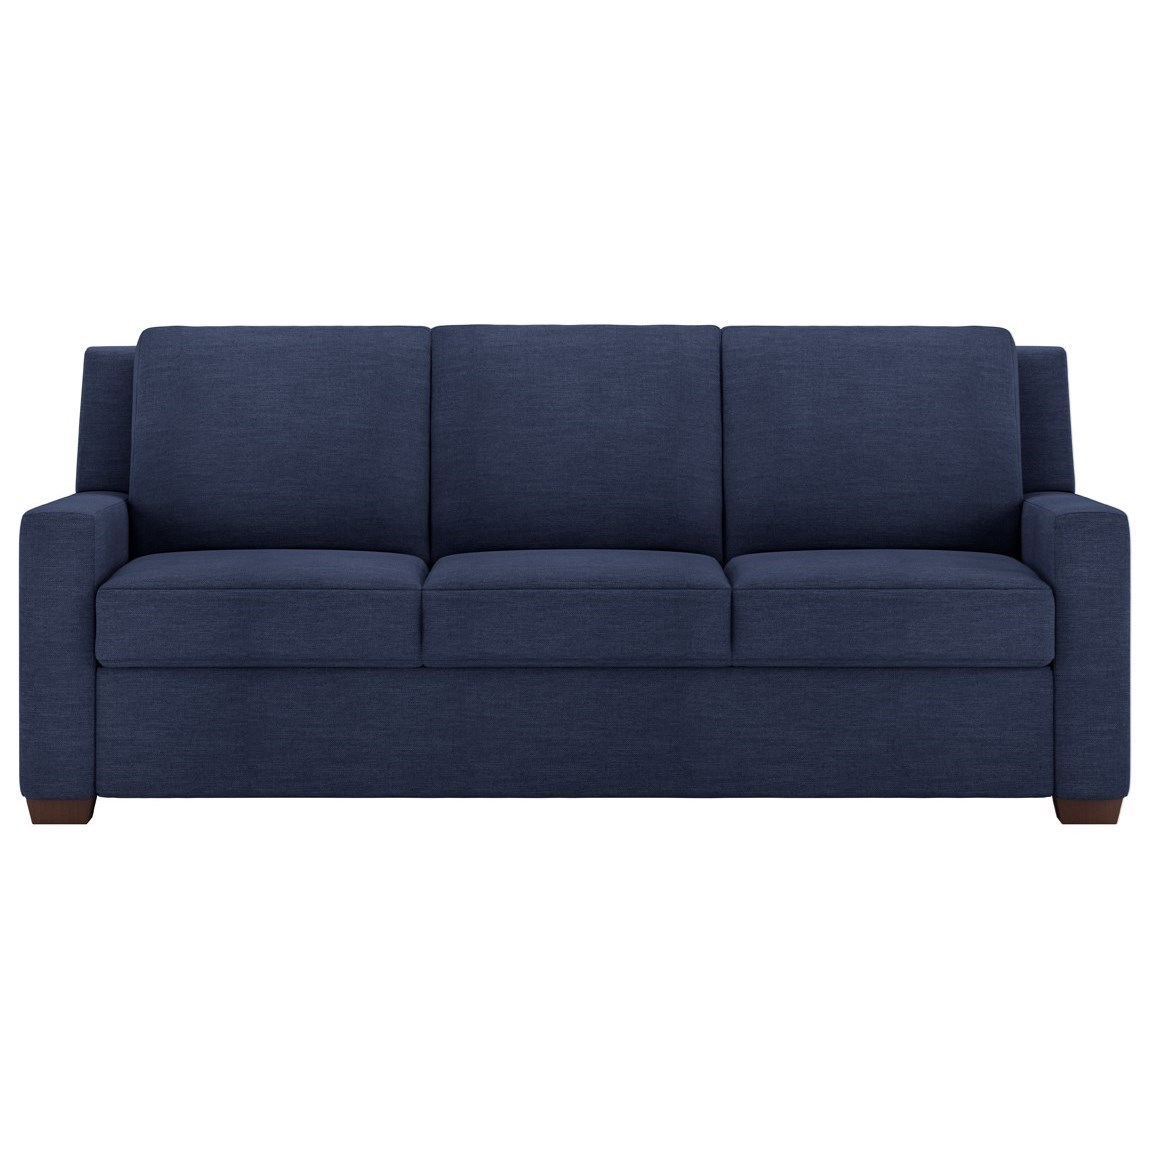 american leather lyons three seat queen size comfort sleeper rh saugertiesfurniture com World's Most Comfortable Sleeper Sofa Bassett Sleeper Sofa